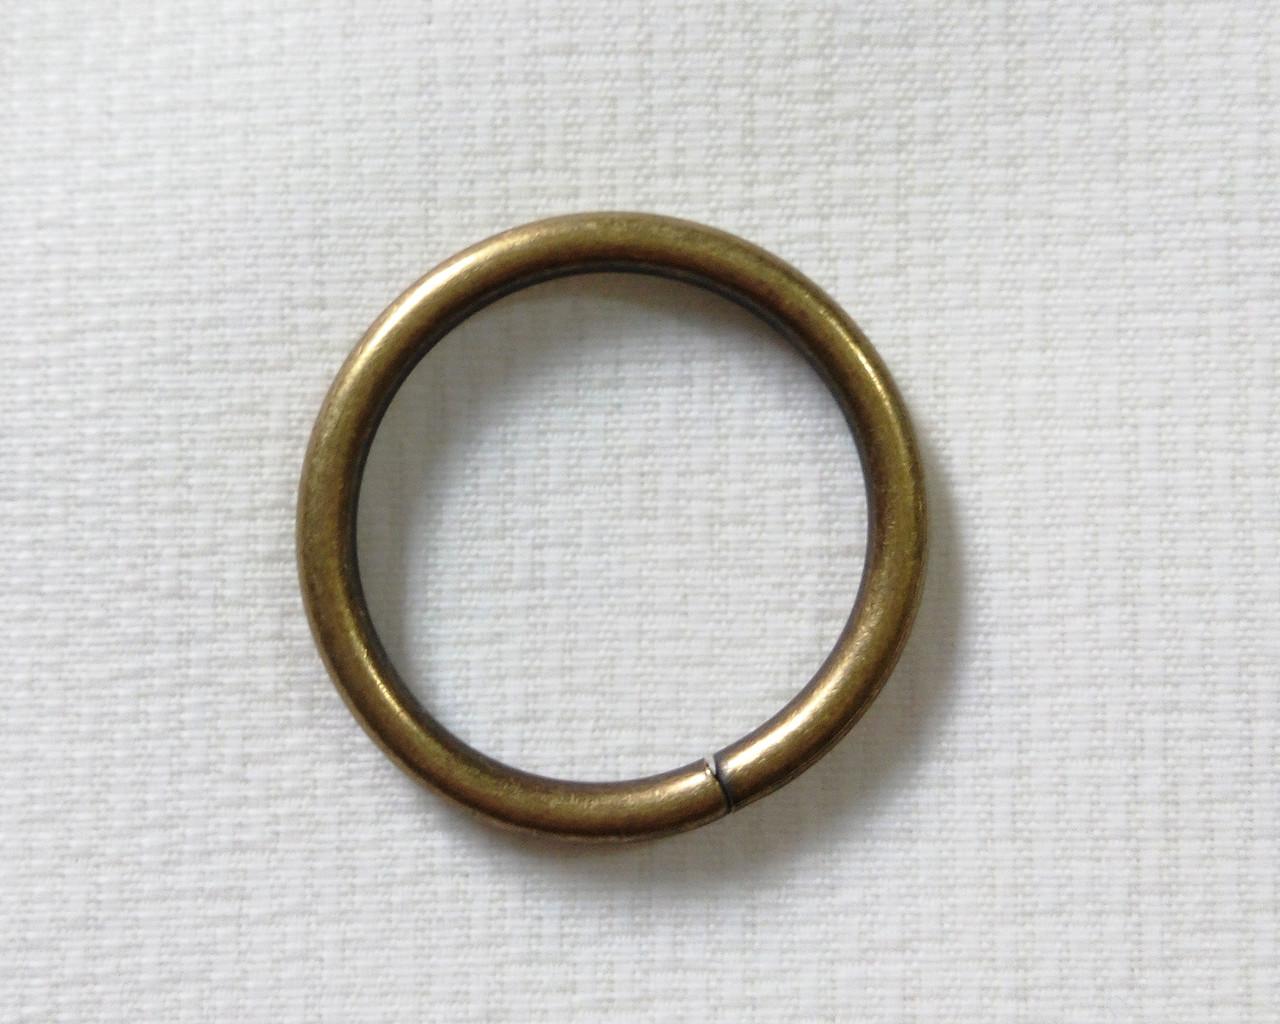 Кольцо обычное д. 19 мм, антик